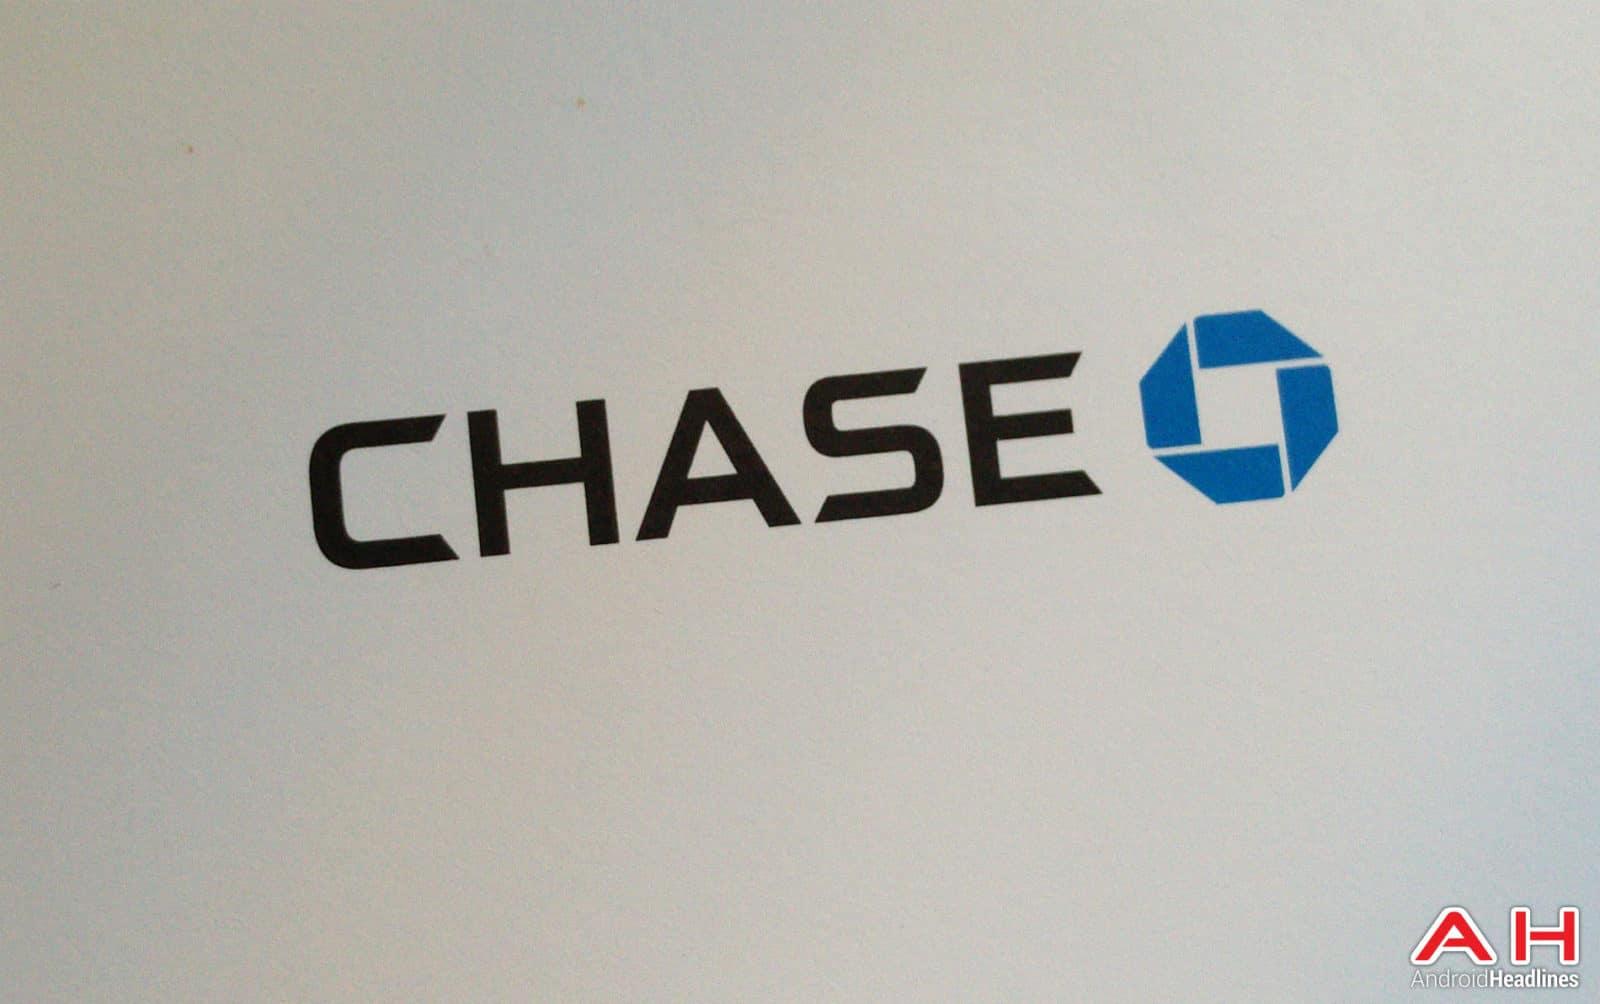 Chase AH